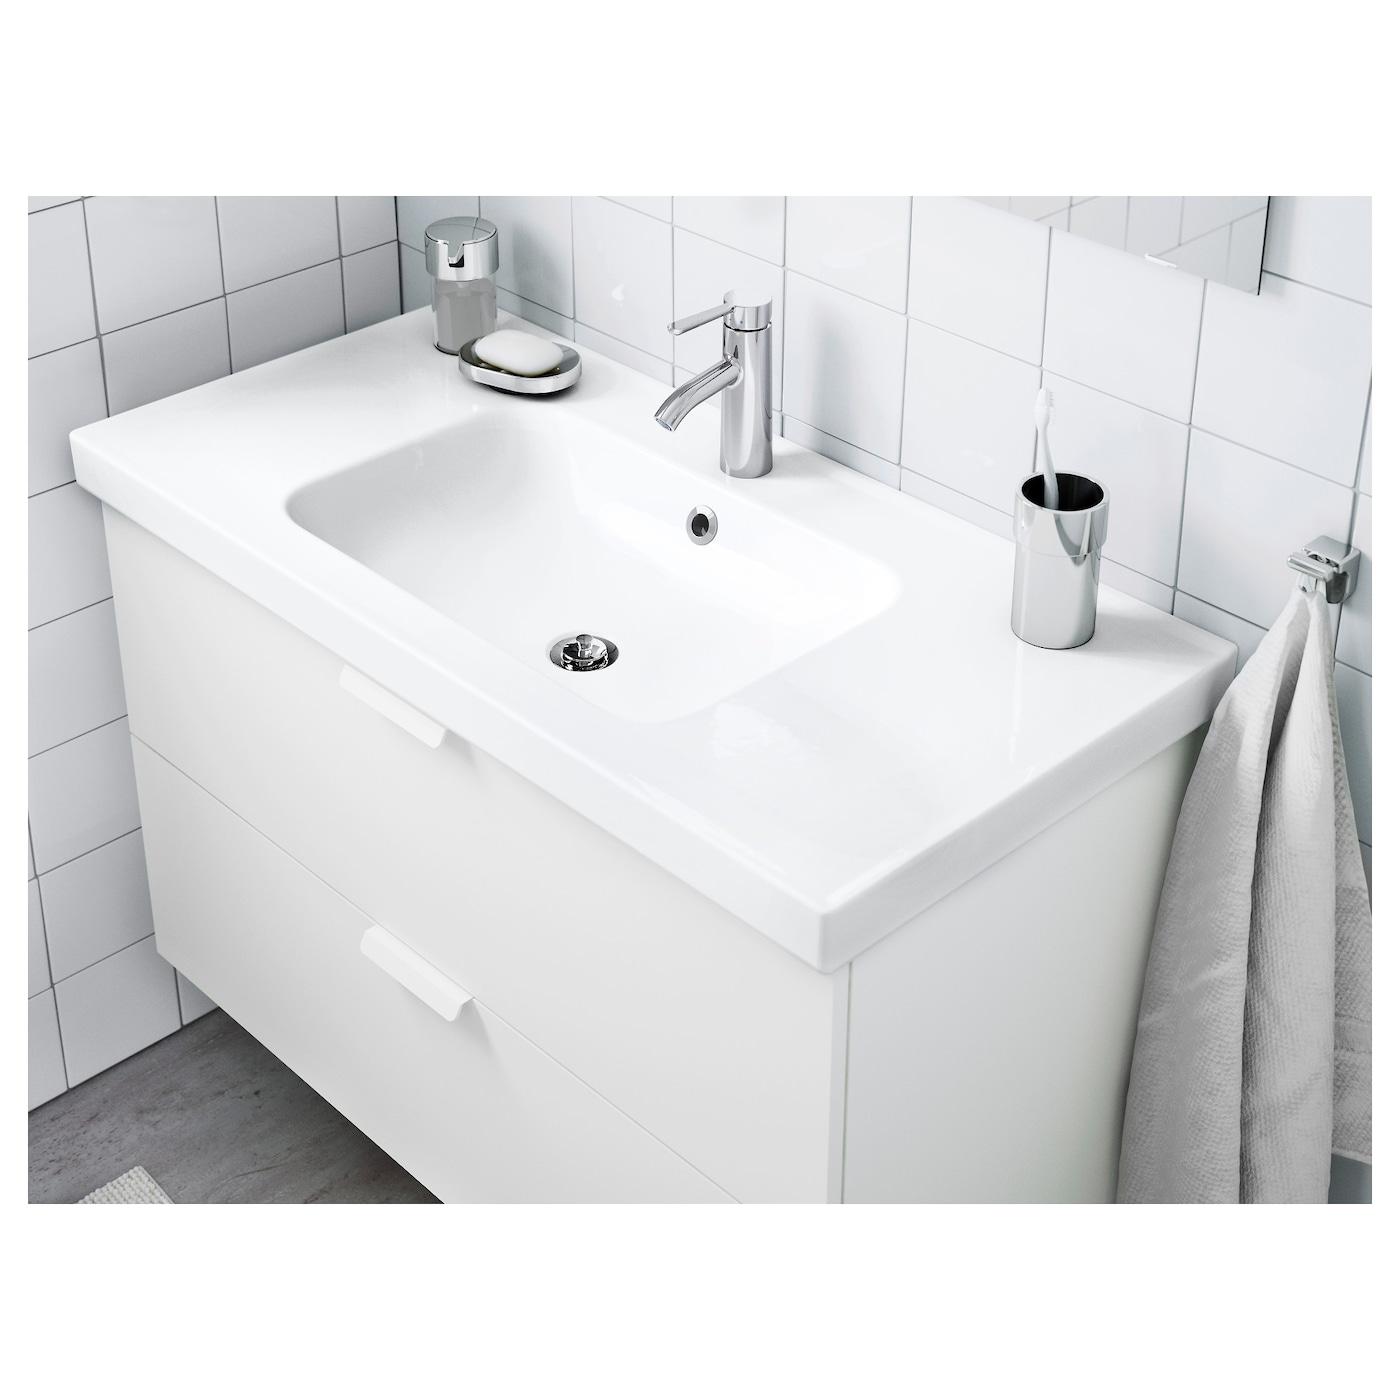 Odensvik wastafel 1 bak 103x49x6 cm ikea for Ikea lavabo